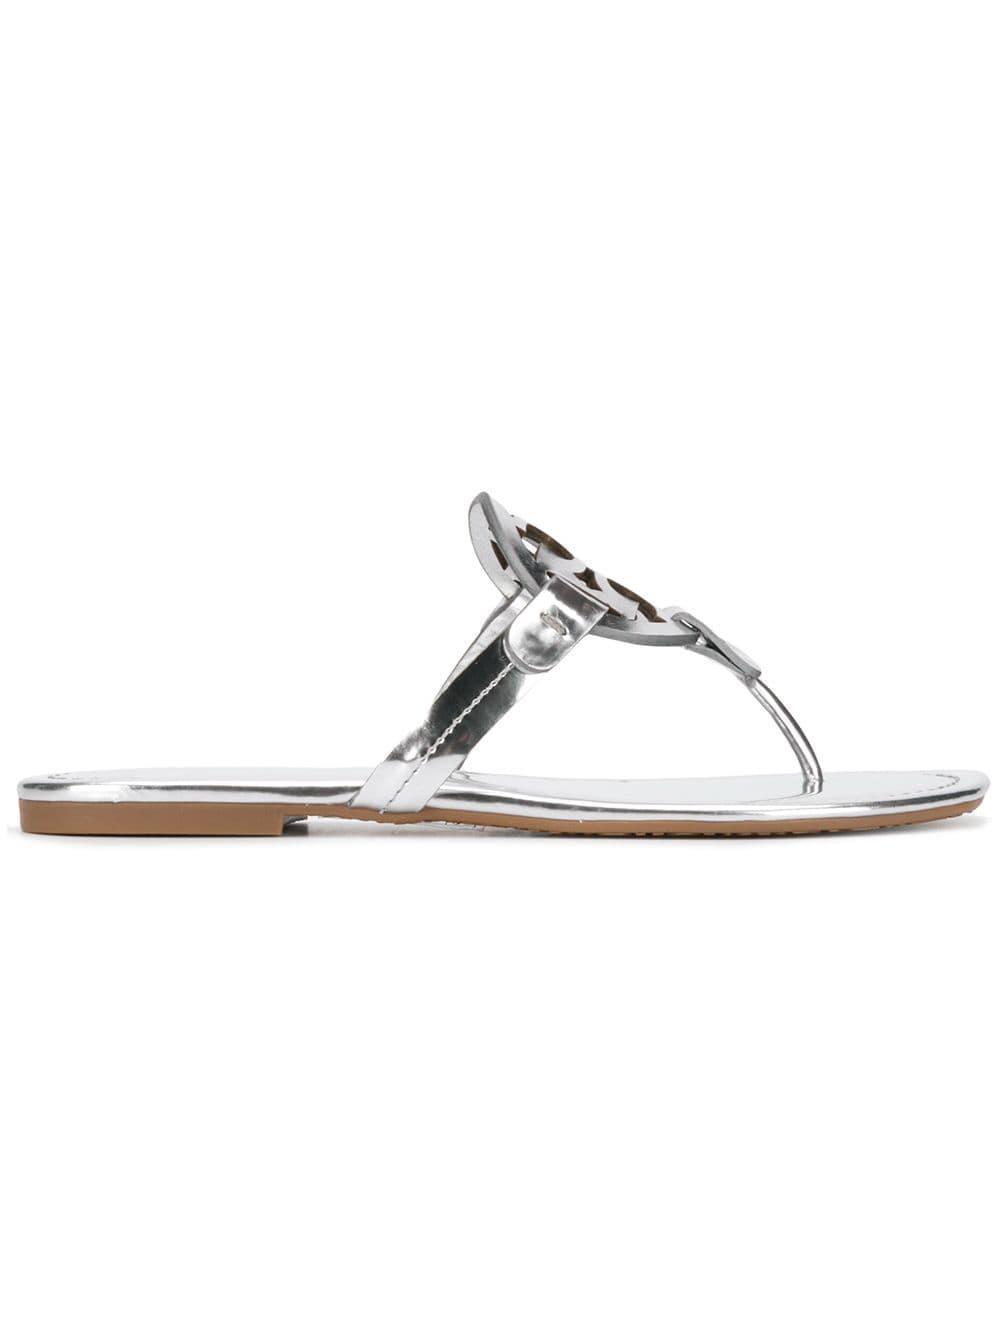 167626ecd0b Lyst - Tory Burch Miller Leather Sandals in Metallic